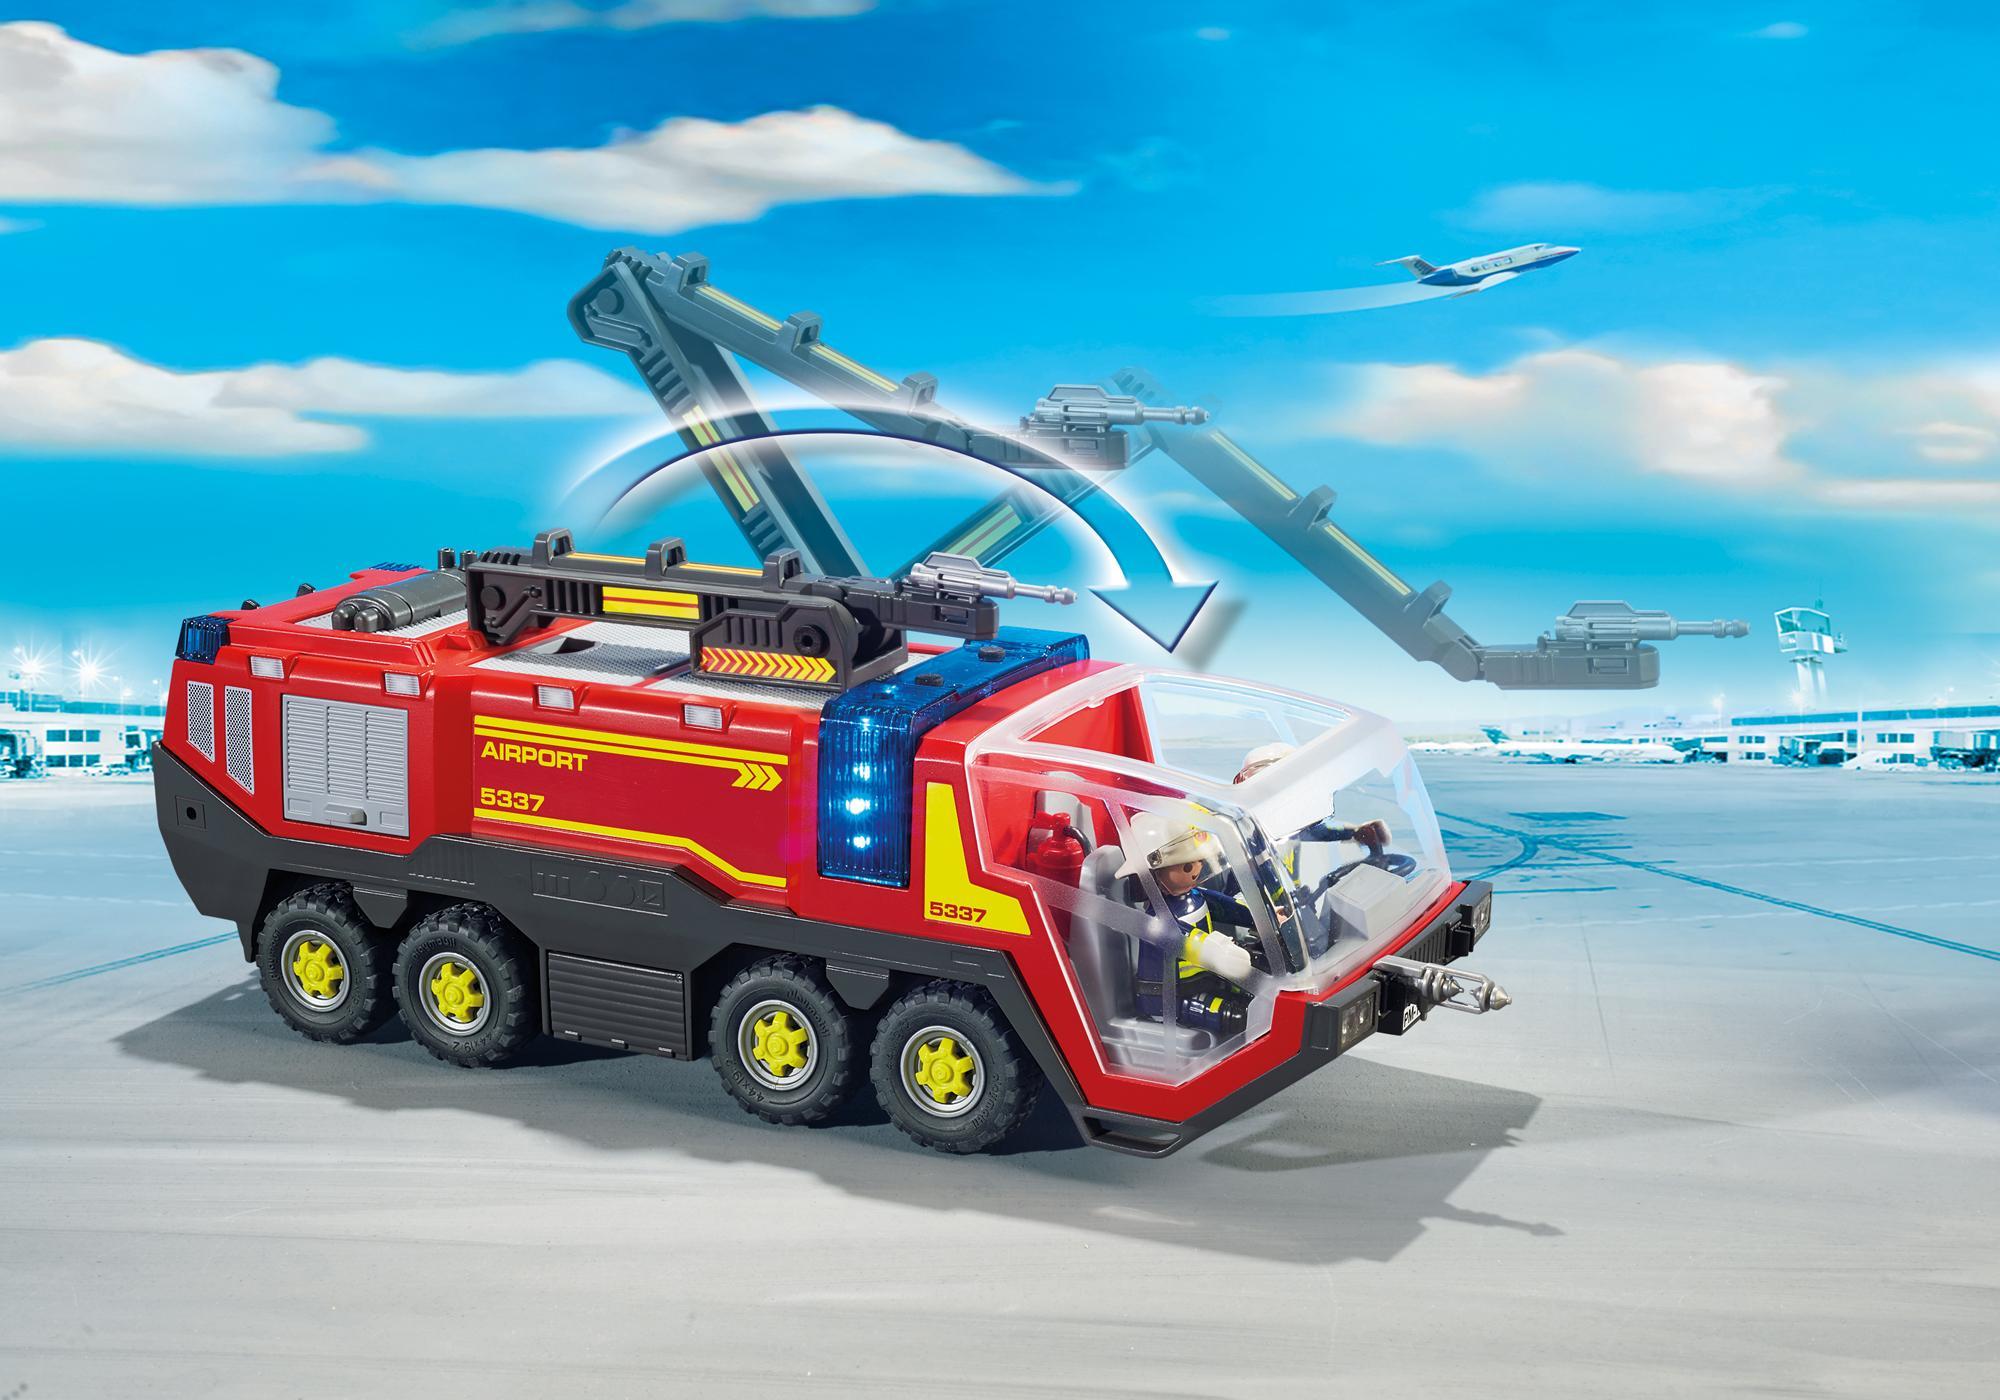 http://media.playmobil.com/i/playmobil/5337_product_extra4/Mezzo antincendio dell'aeroporto